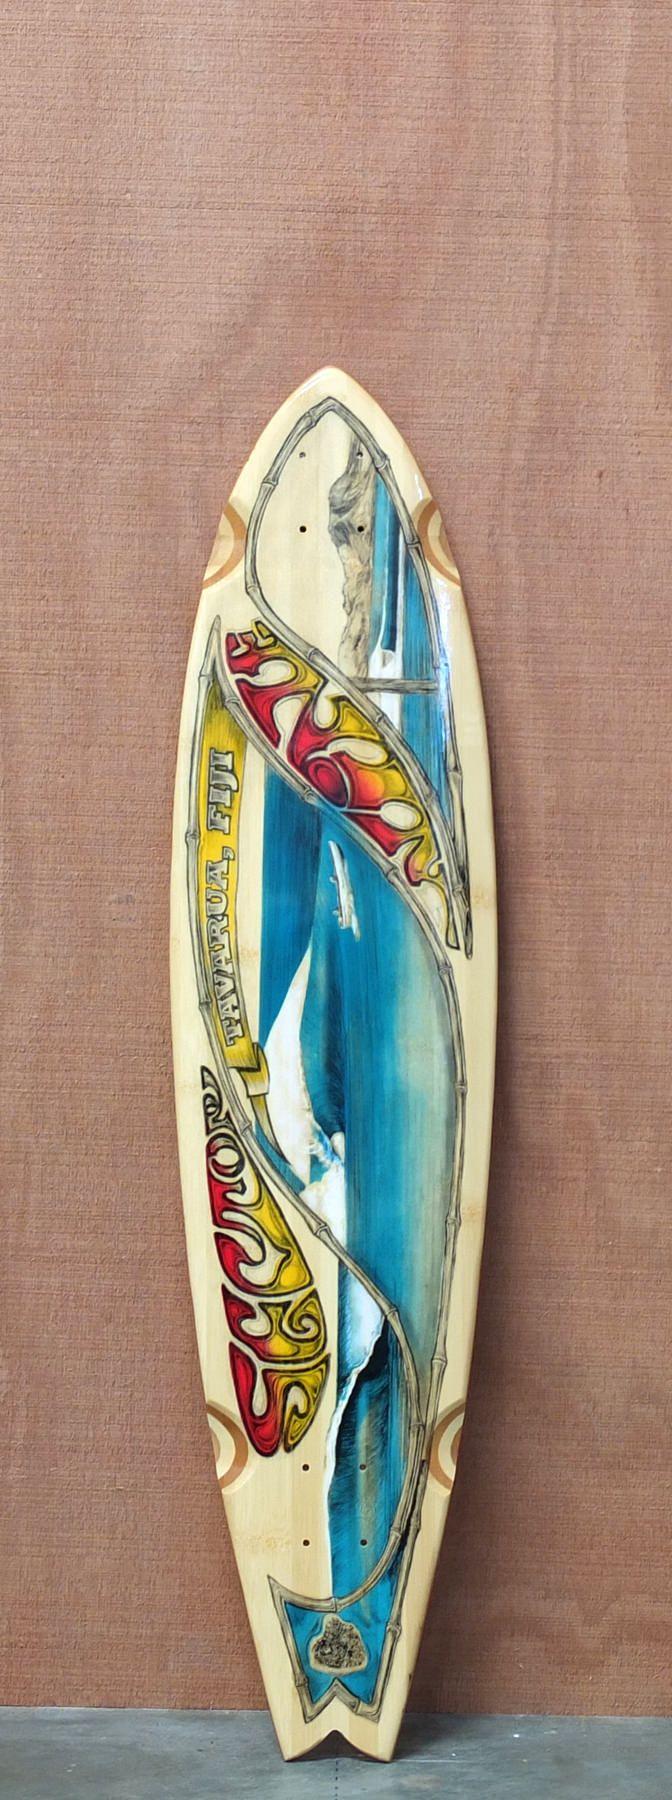 "$75.00 Sector 9 39.5"" Bamboo Fiji Longboard Deck"